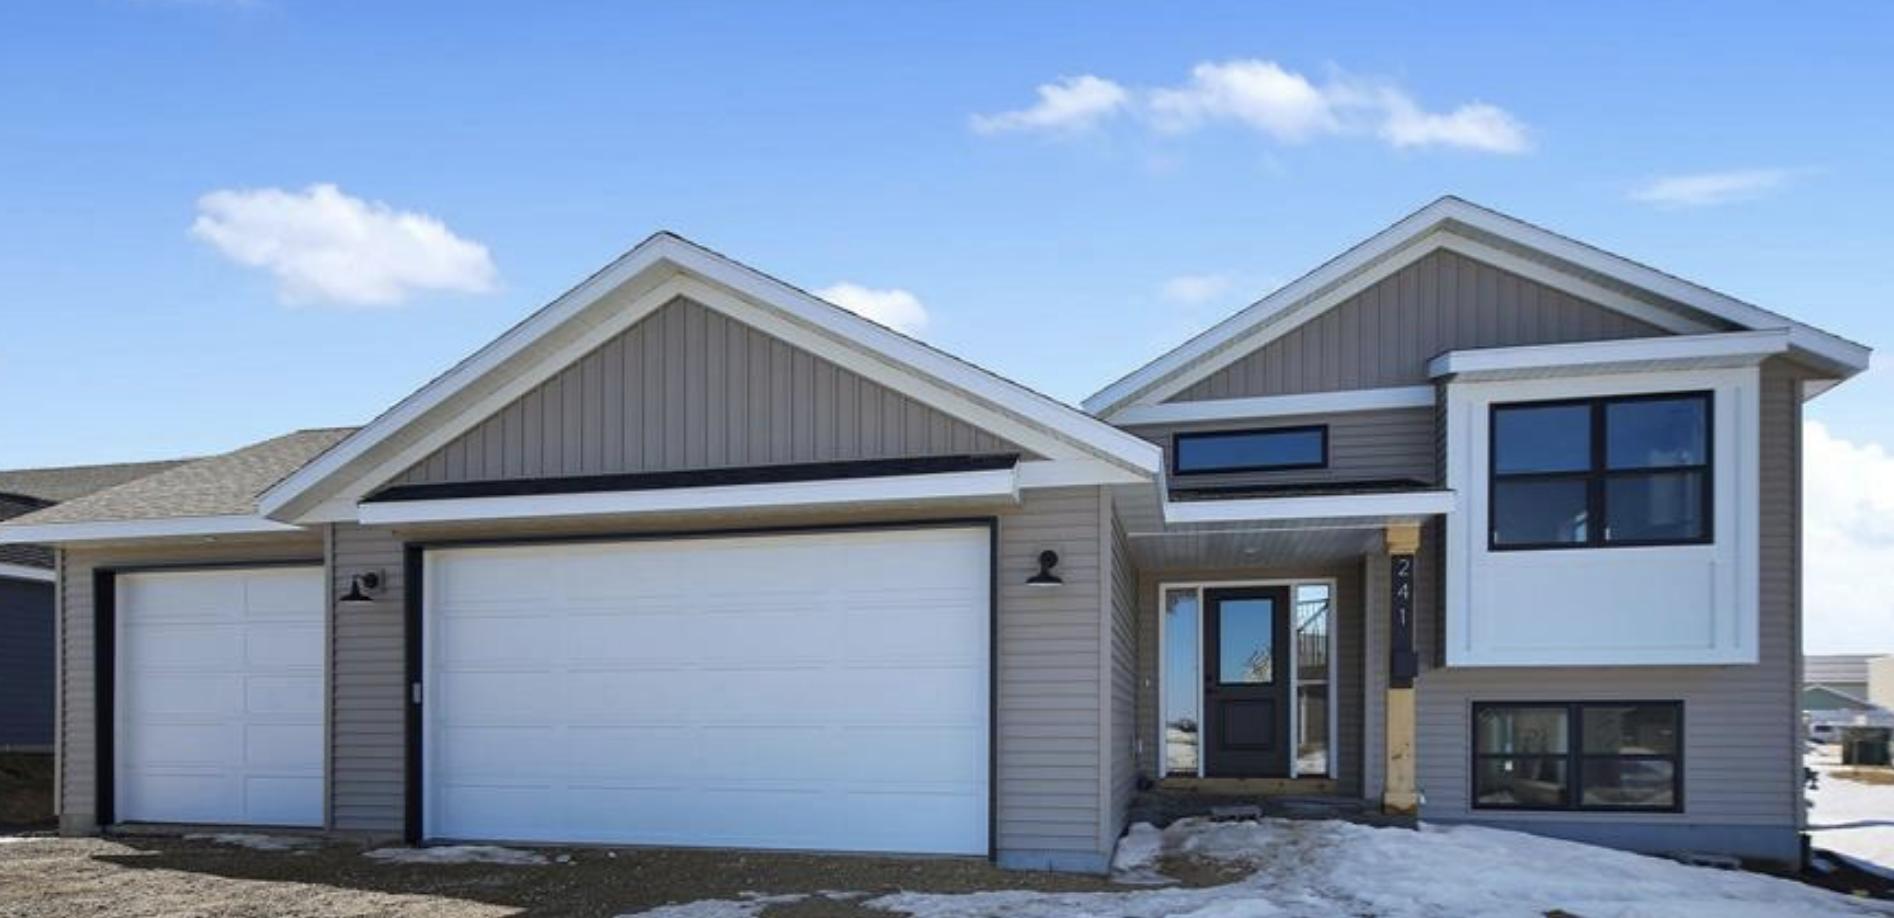 241 Whetstone Place NW Property Photo - Eyota, MN real estate listing